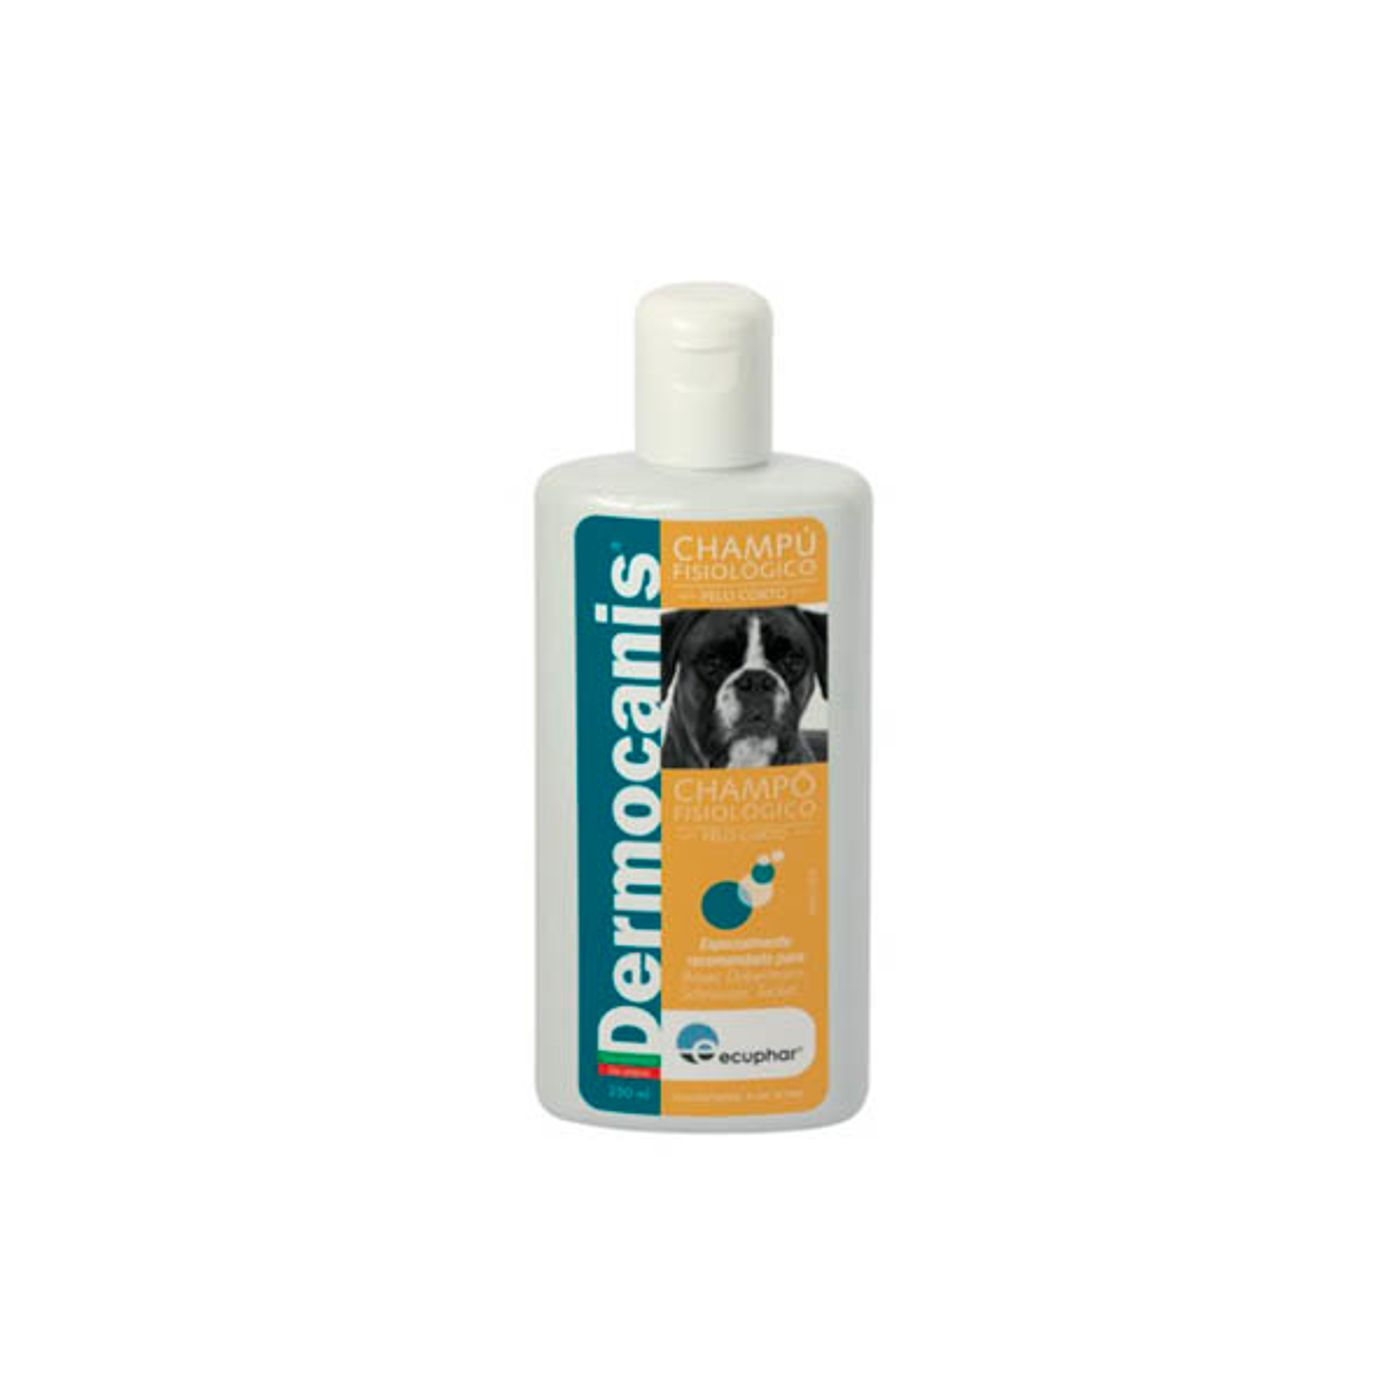 Dermocanis-Champo-Pelo-Curto-Alergias-250-ml